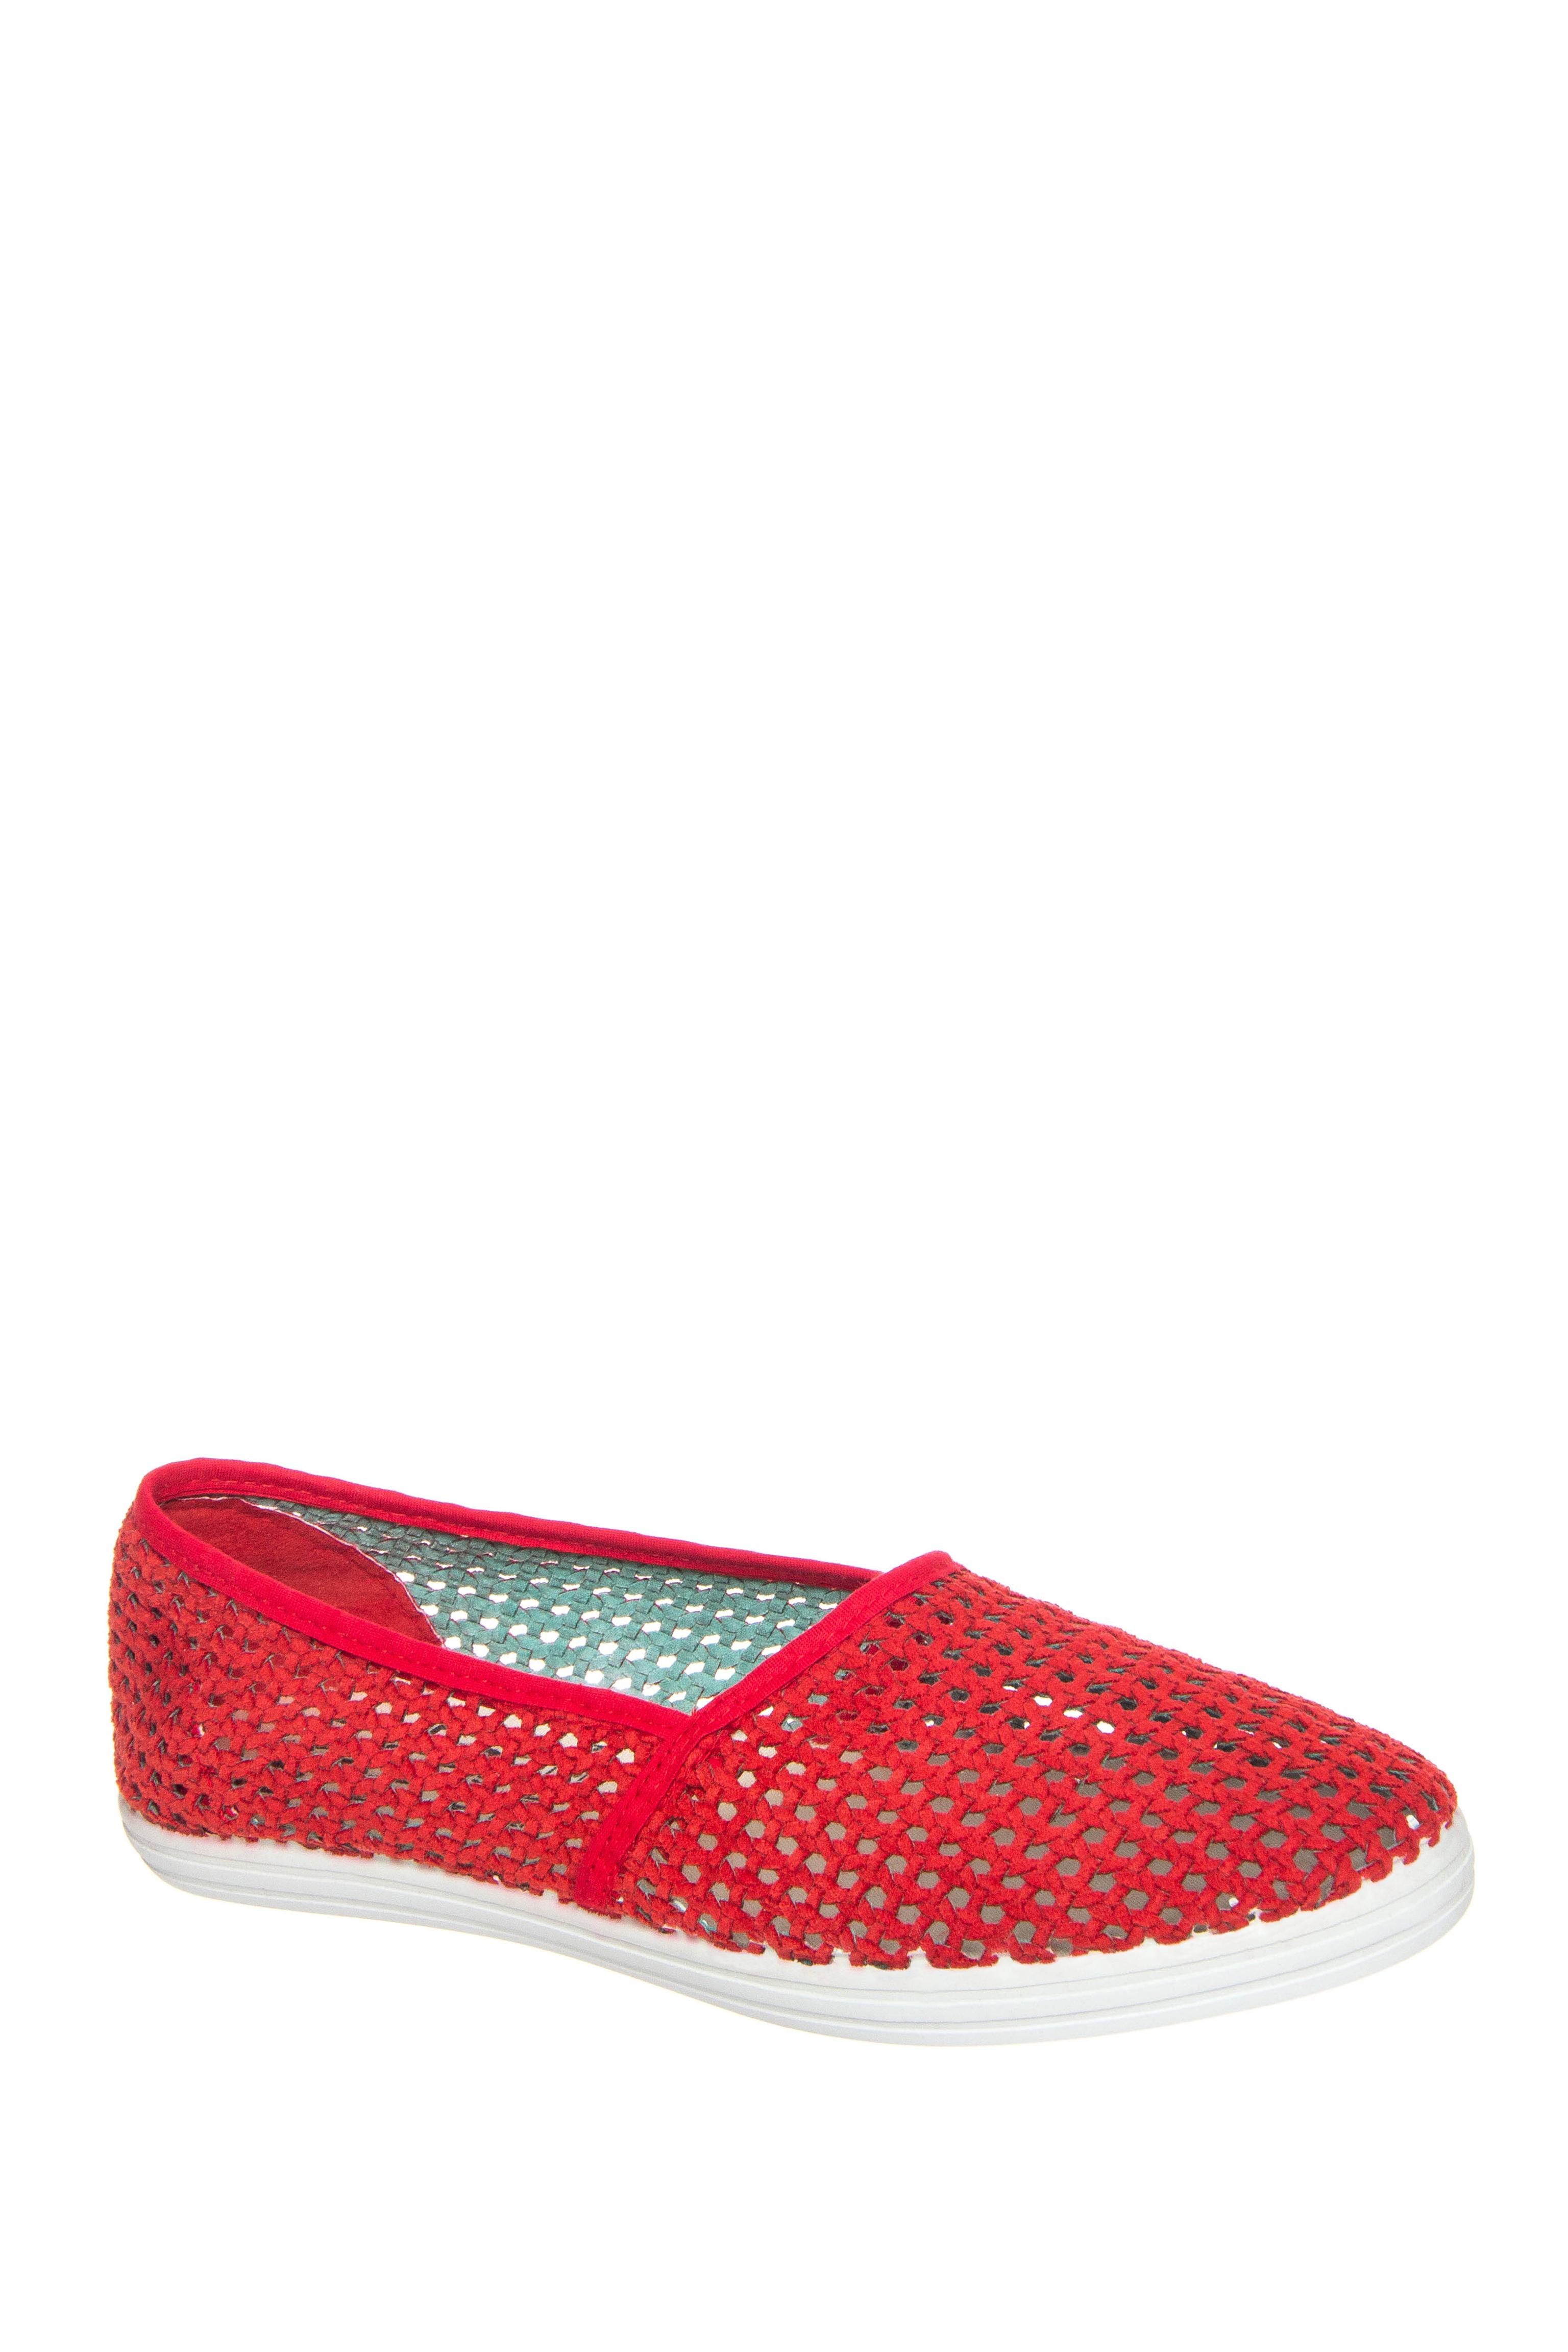 Miz Mooz Breeze Weave Flats - Red